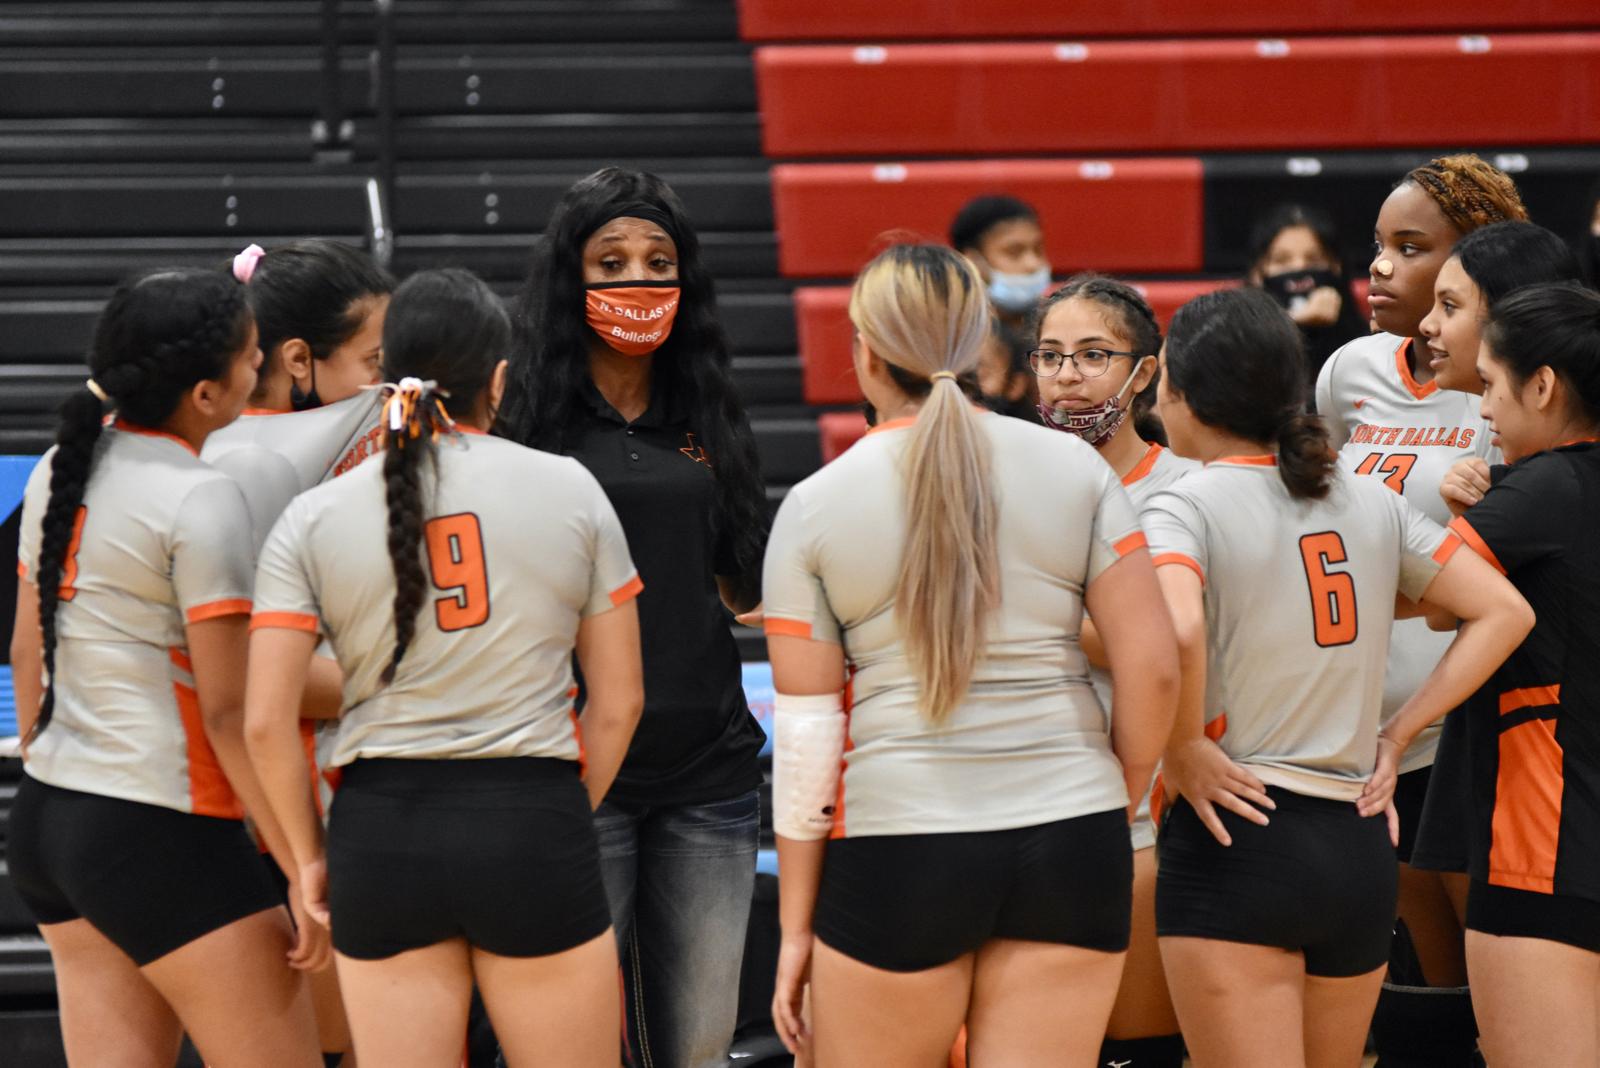 Photo gallery: North Dallas girls volleyball team vs. Carter — Sept. 25, 2020